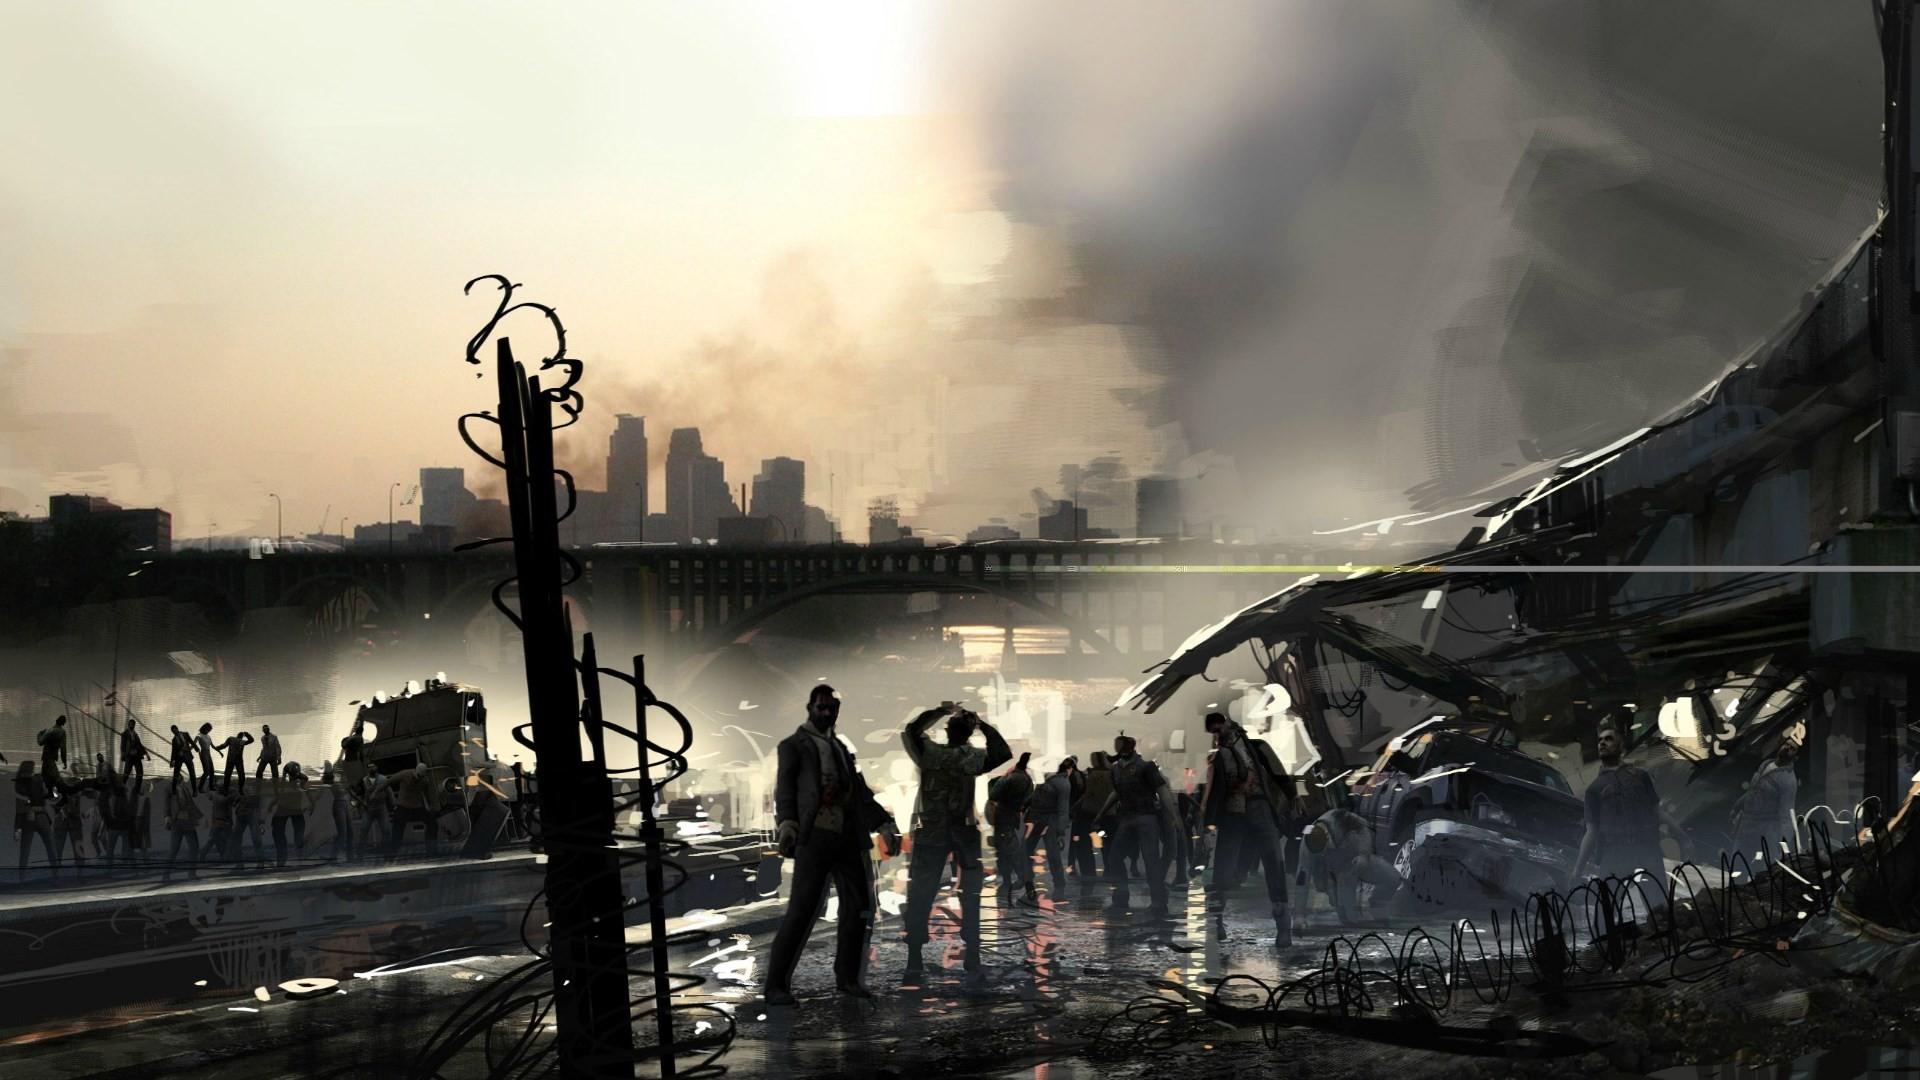 zombie apocalypse wallpaper – Google Search | Zombies | Pinterest .